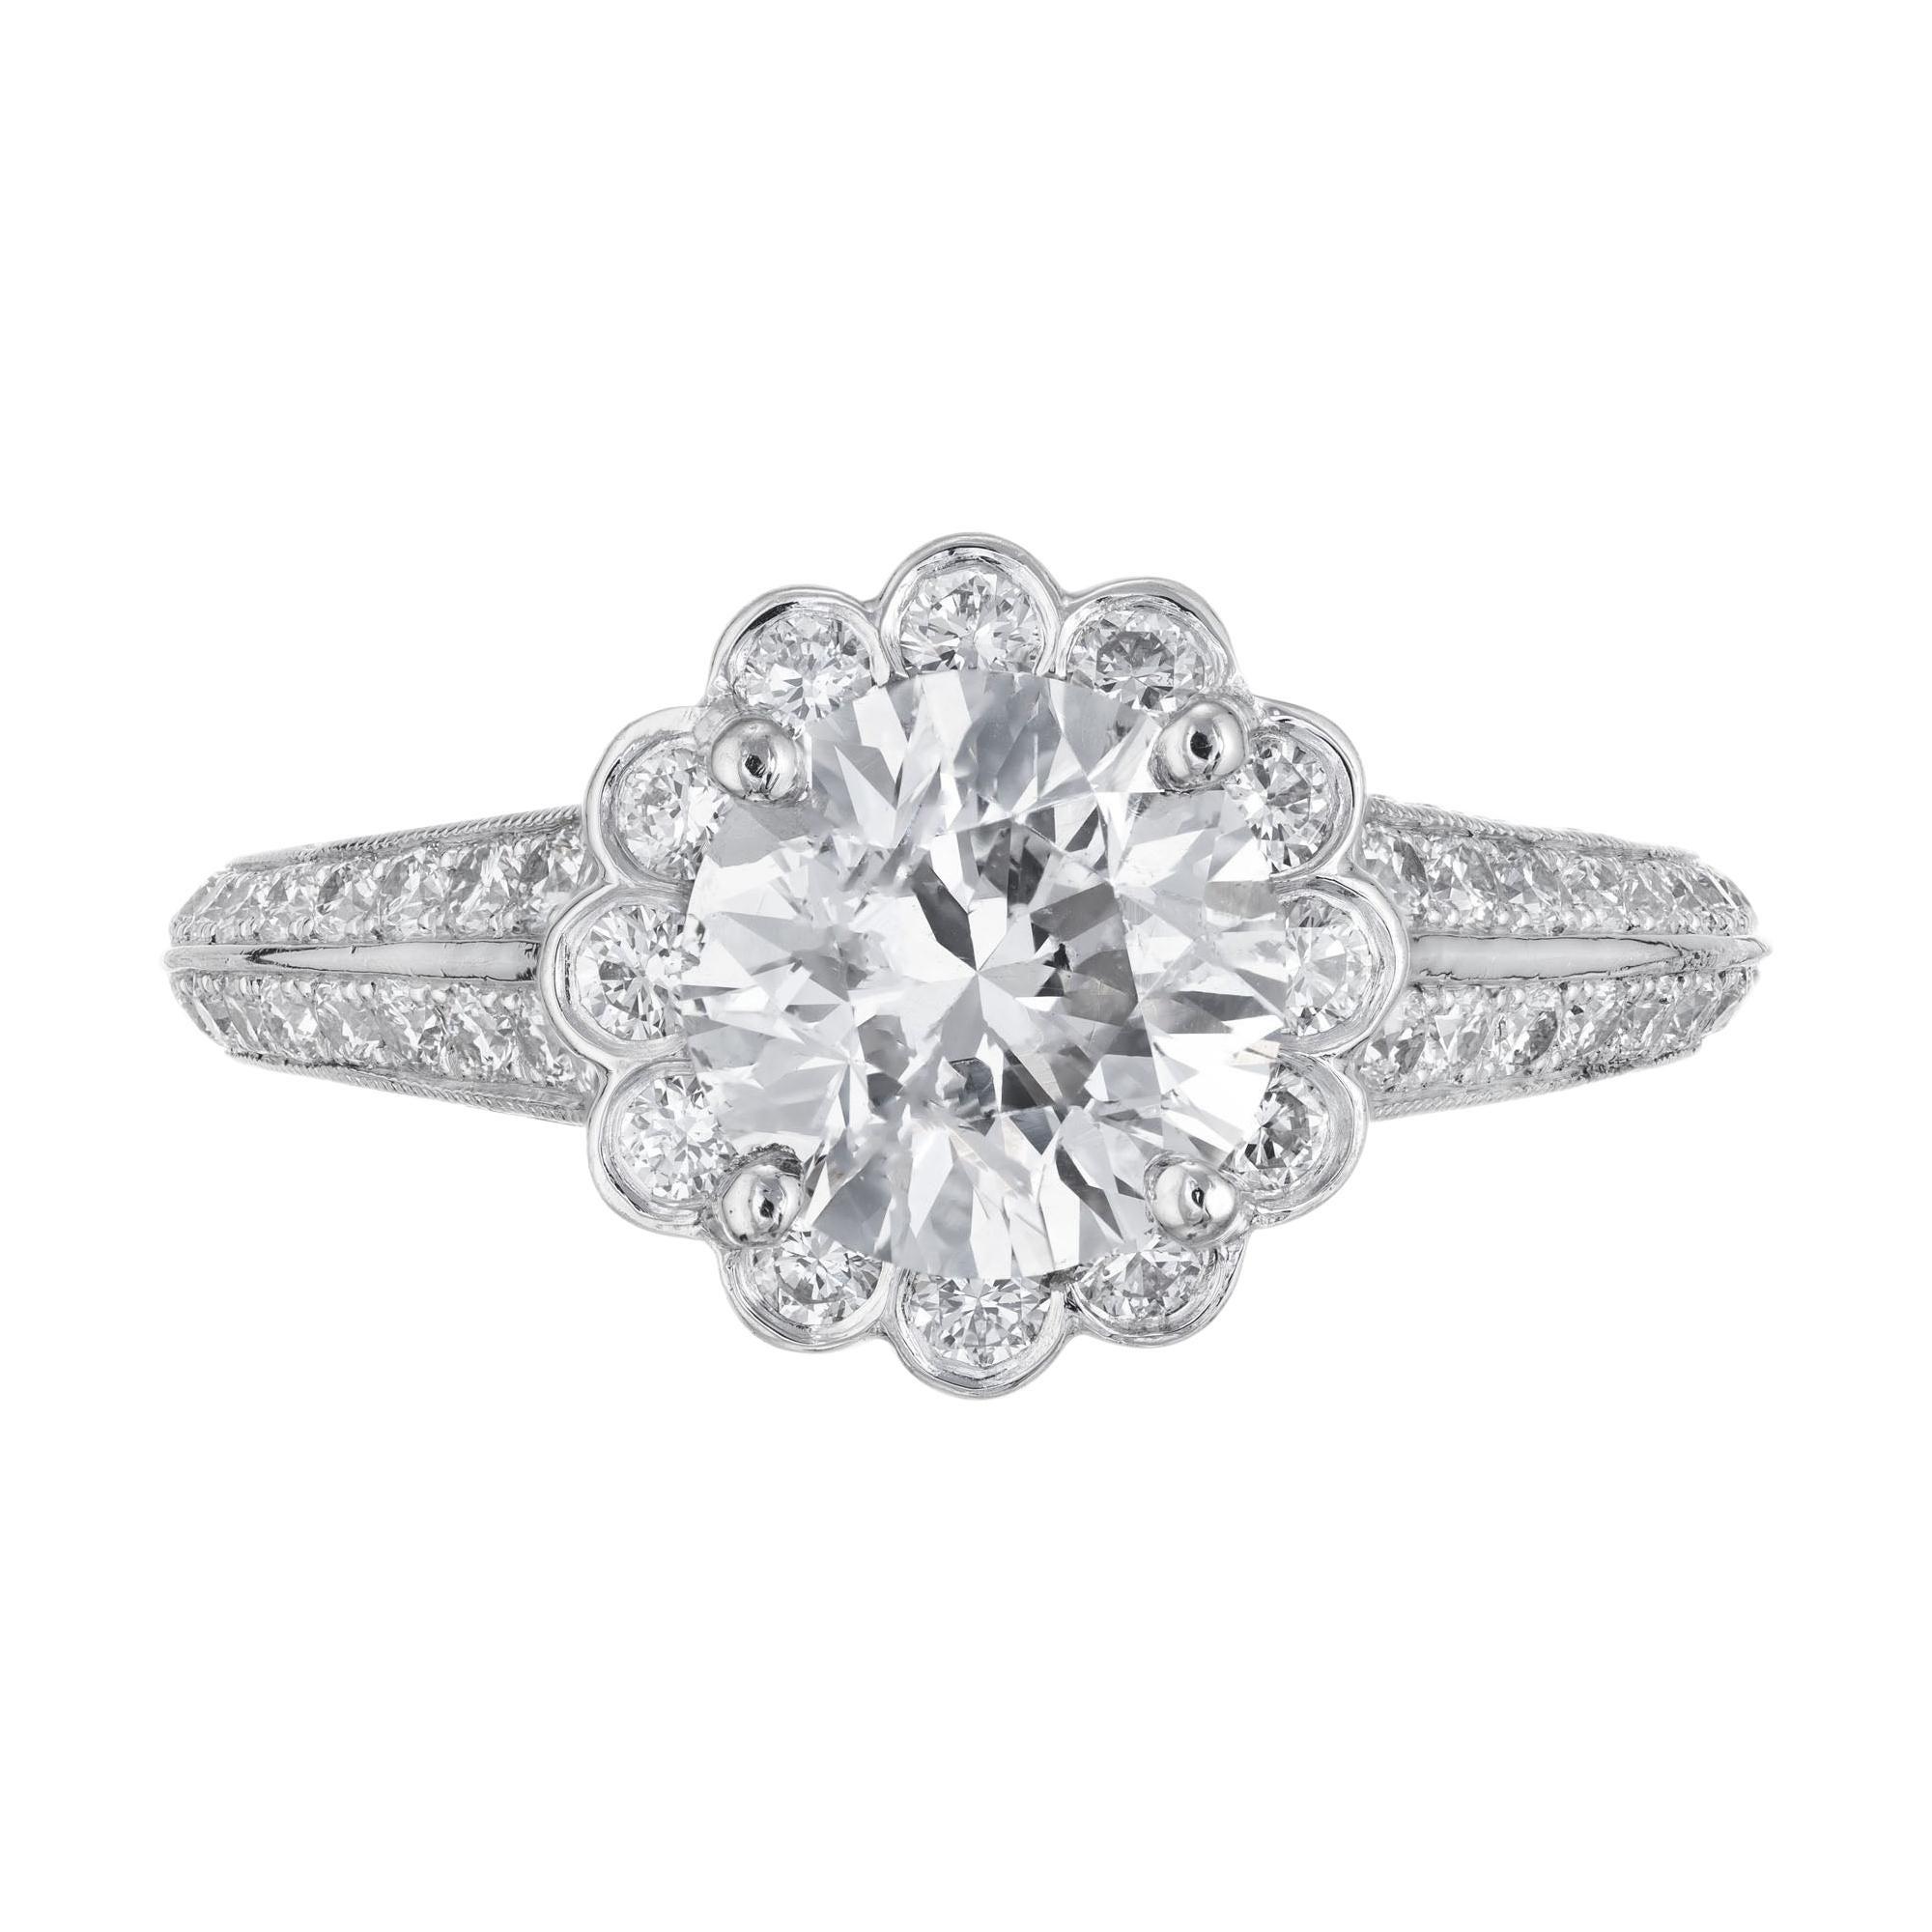 Peter Suchy 1.55 Carat Halo Diamond Platinum Engagement Ring